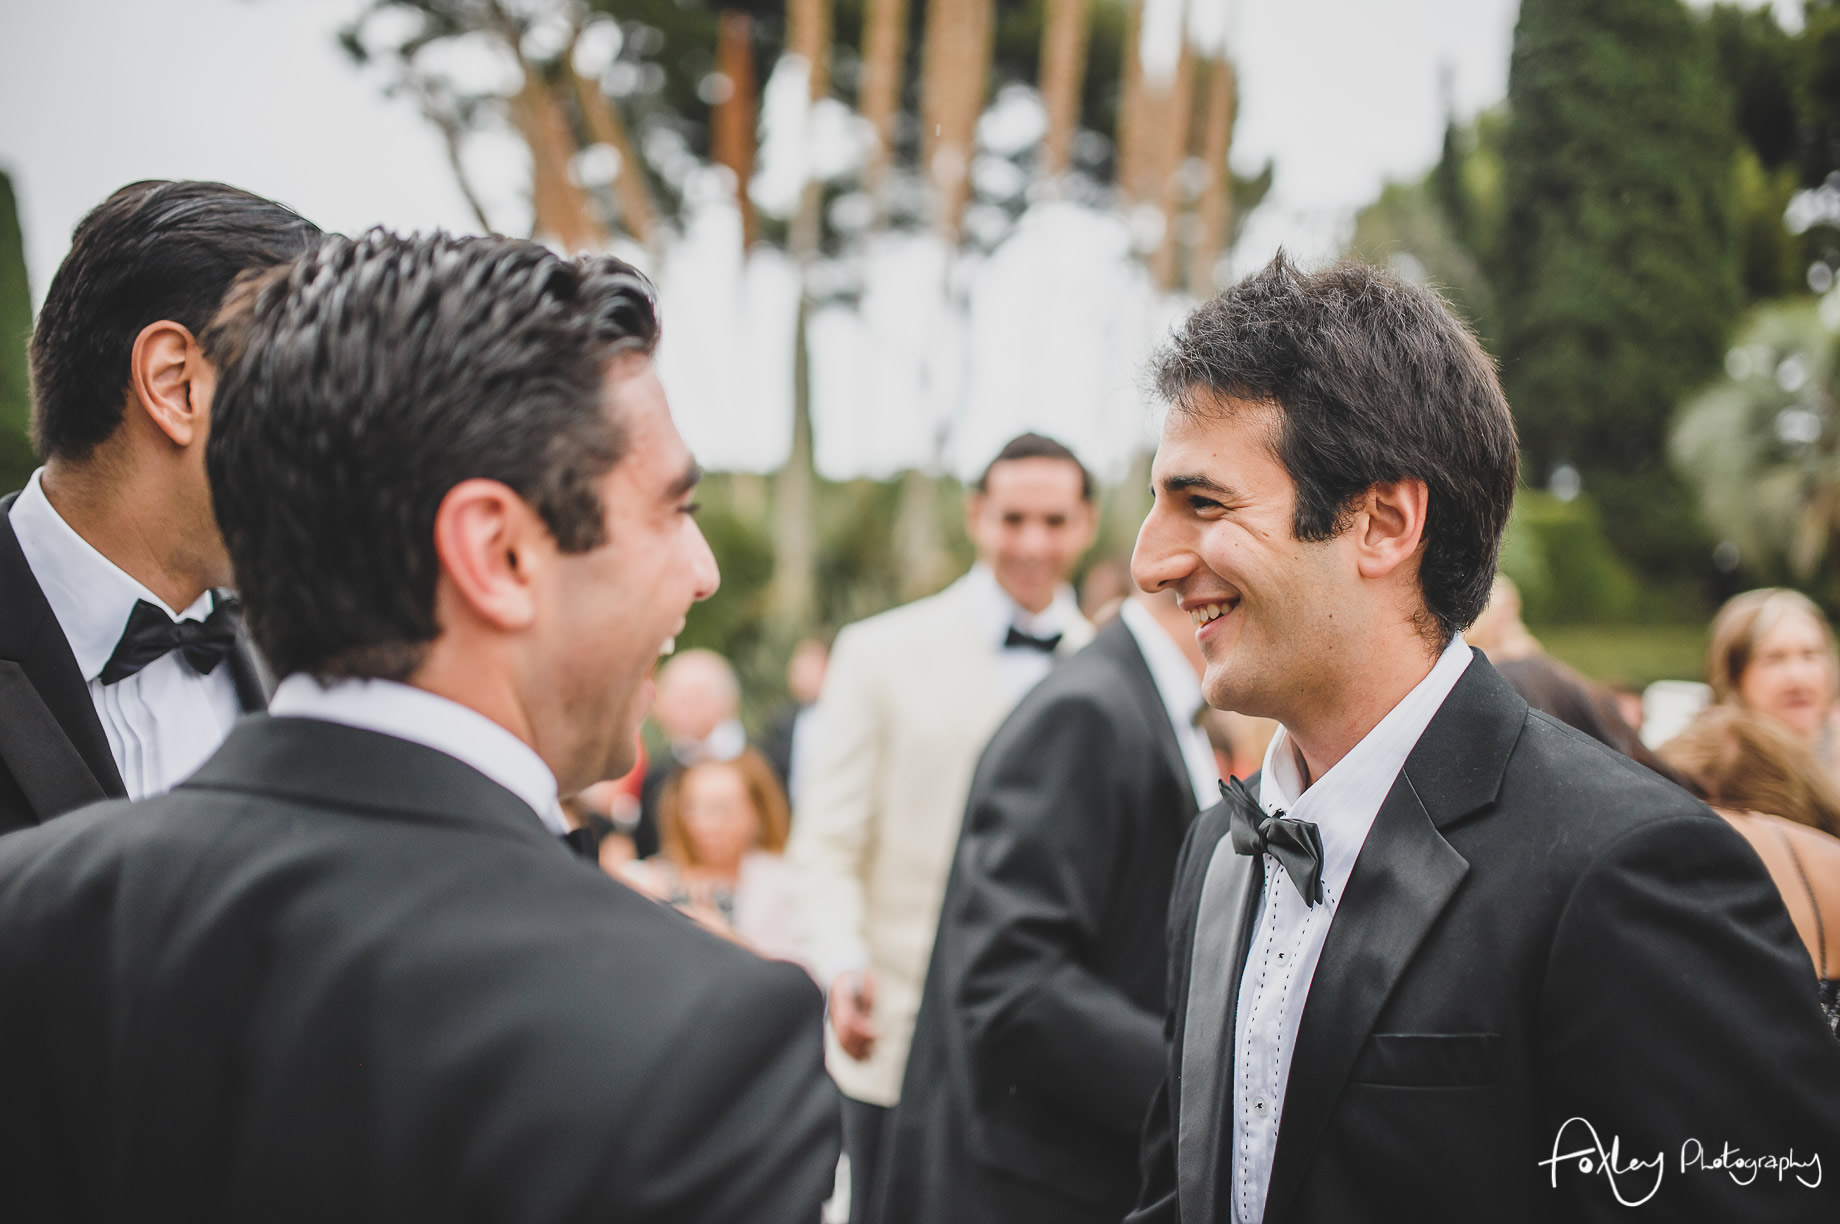 Jil and Will's Wedding at Villa Ephrussi De Rothschild 068